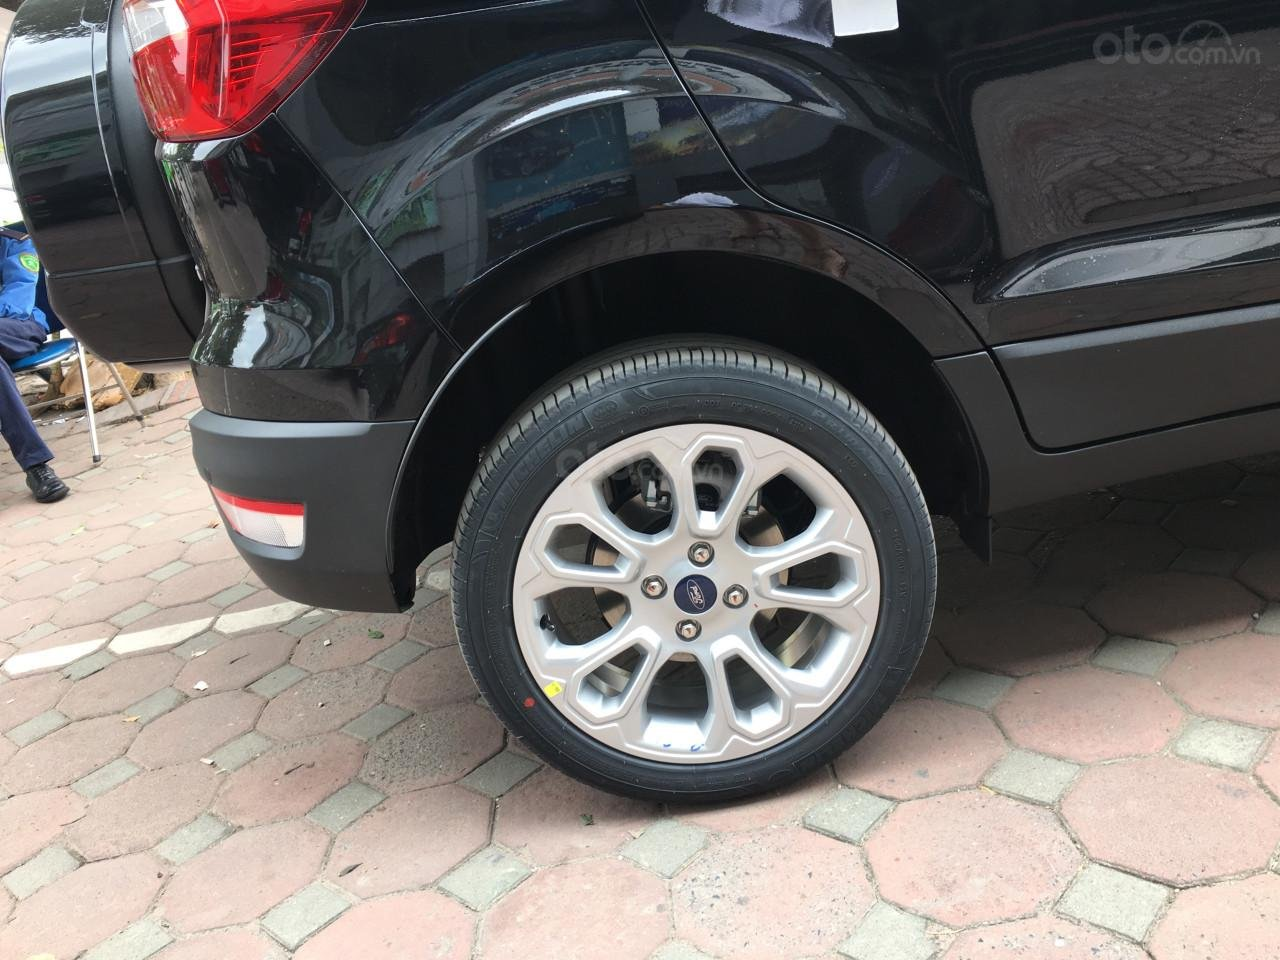 0358548613 - Bán xe Ford EcoSport Titanium 1.5L - tặng ngay bảo hiểm thân vỏ khi mua Ecosport Titanium mới-4